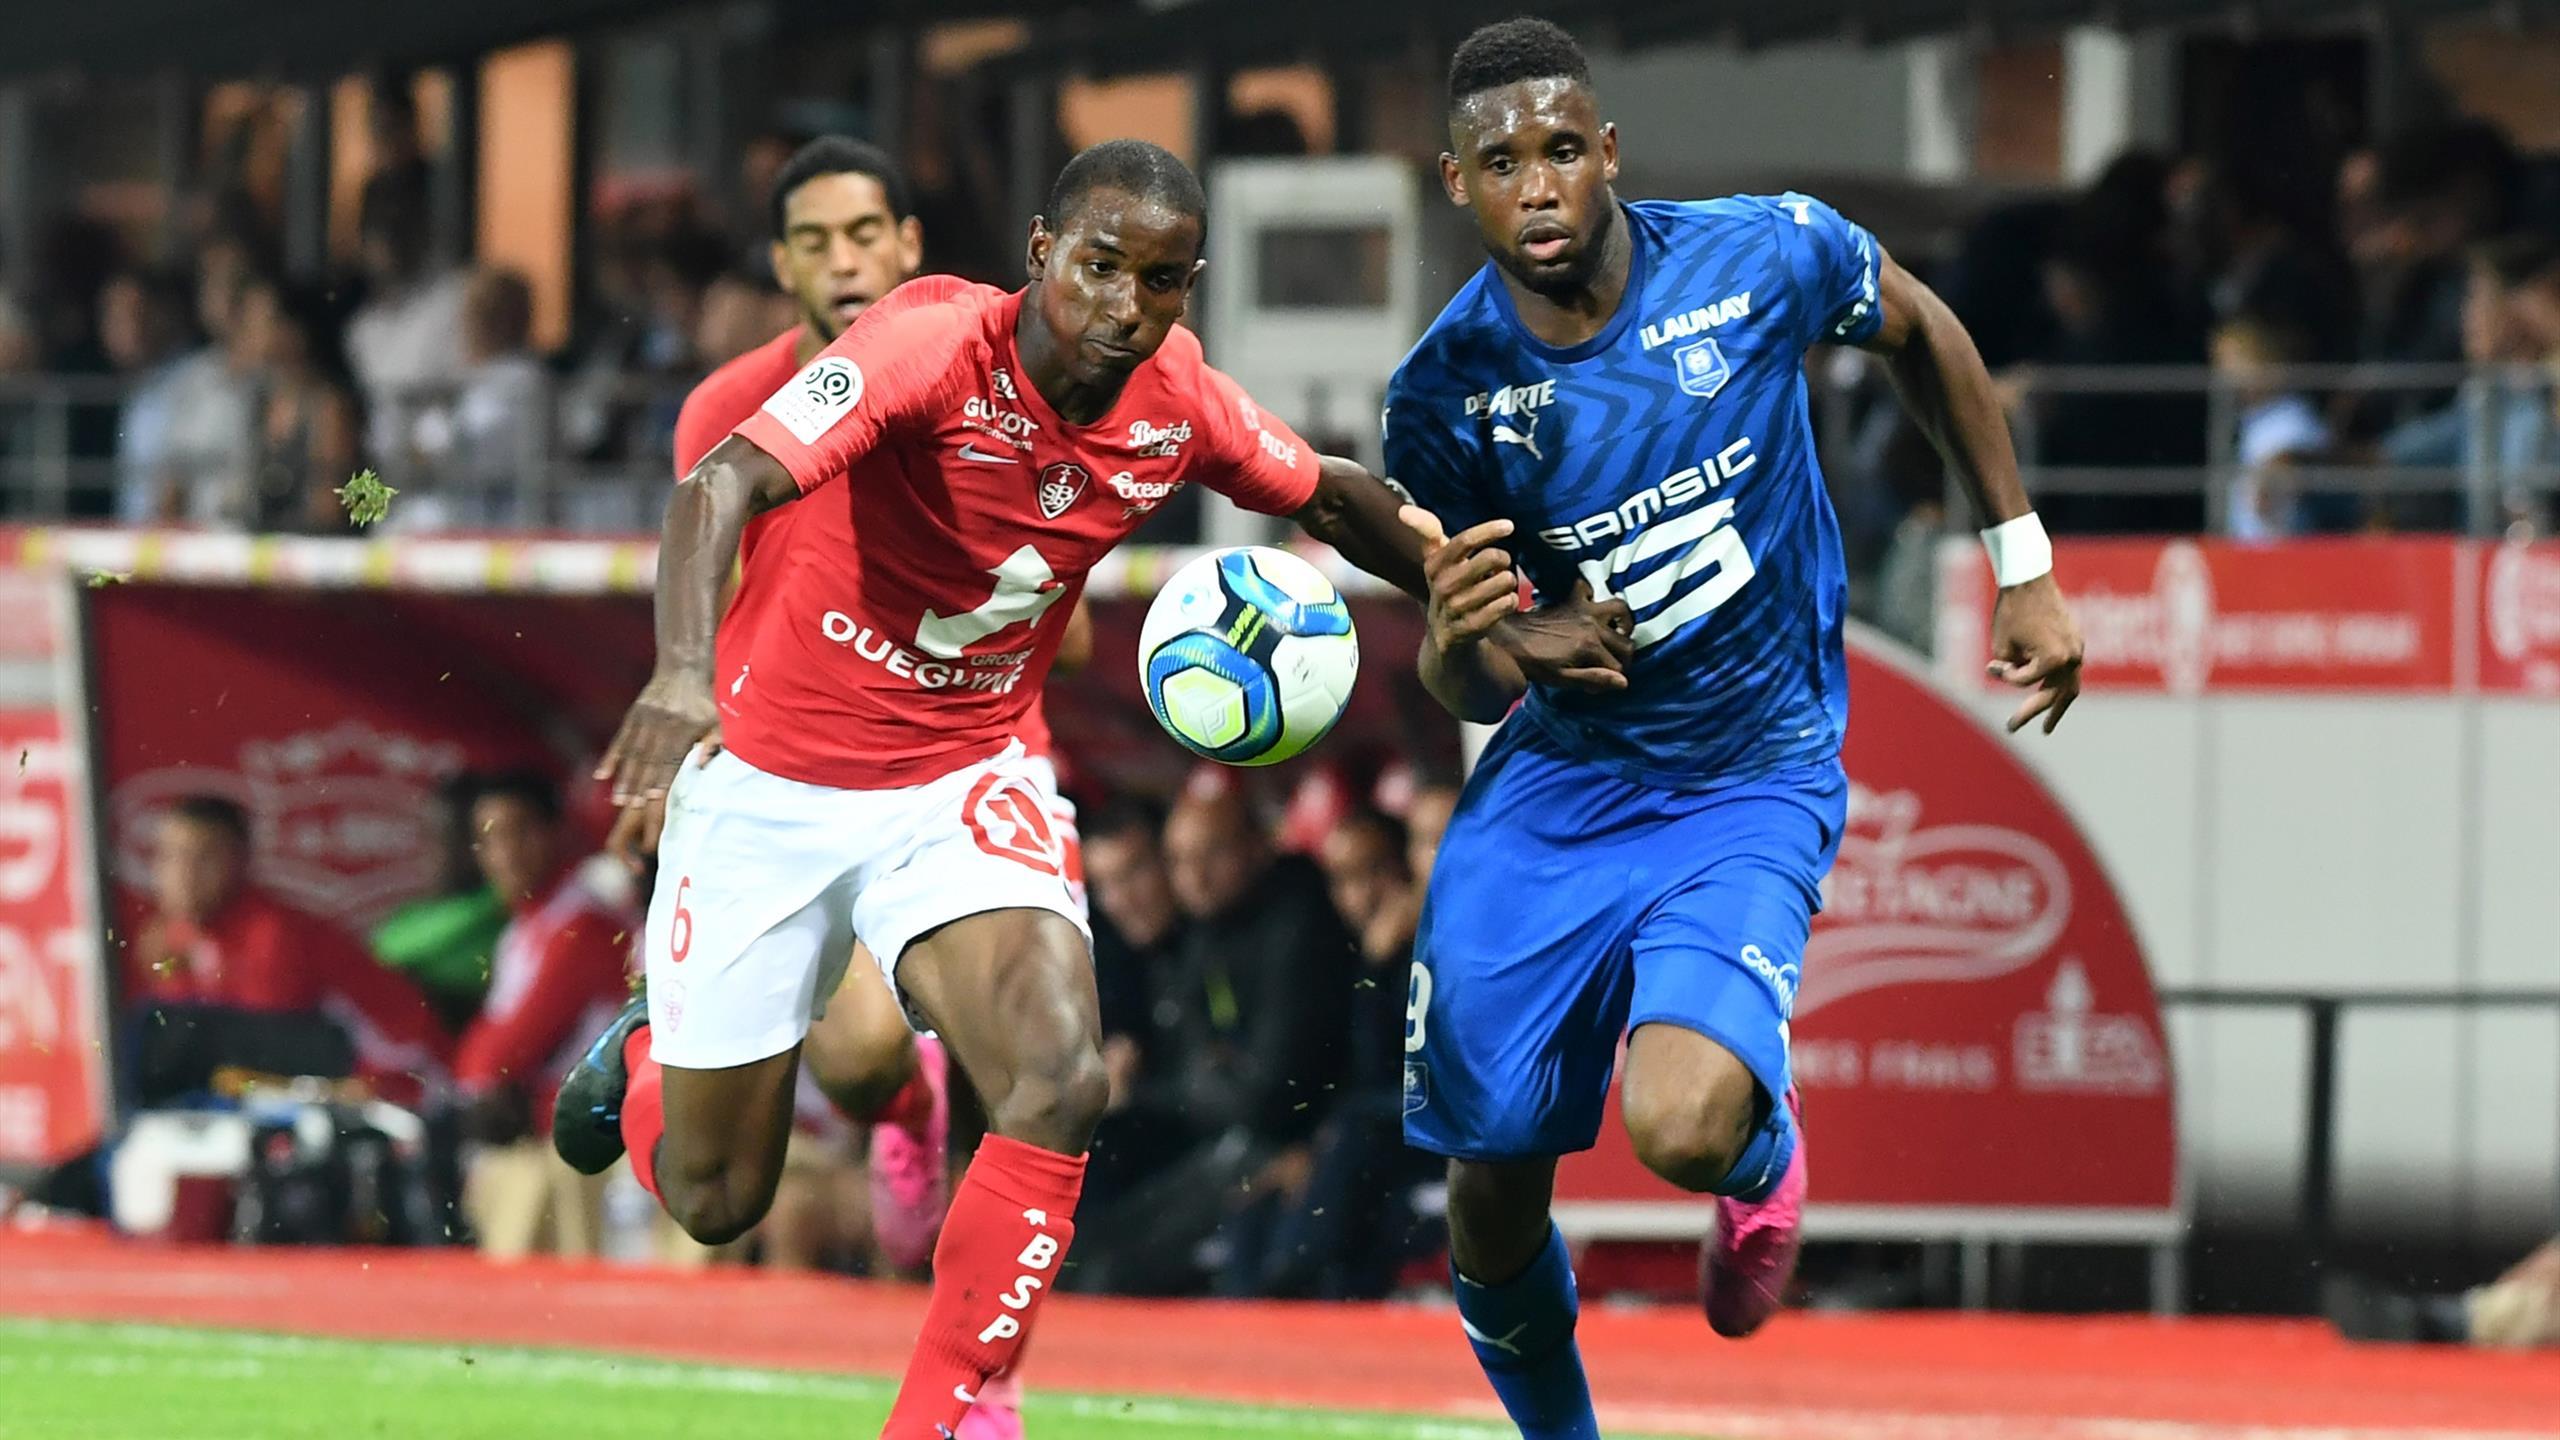 Ralph Hasenhuttl Confirms Saints Have Signed Midfielder Ibrahima Diallo From Brest Eurosport